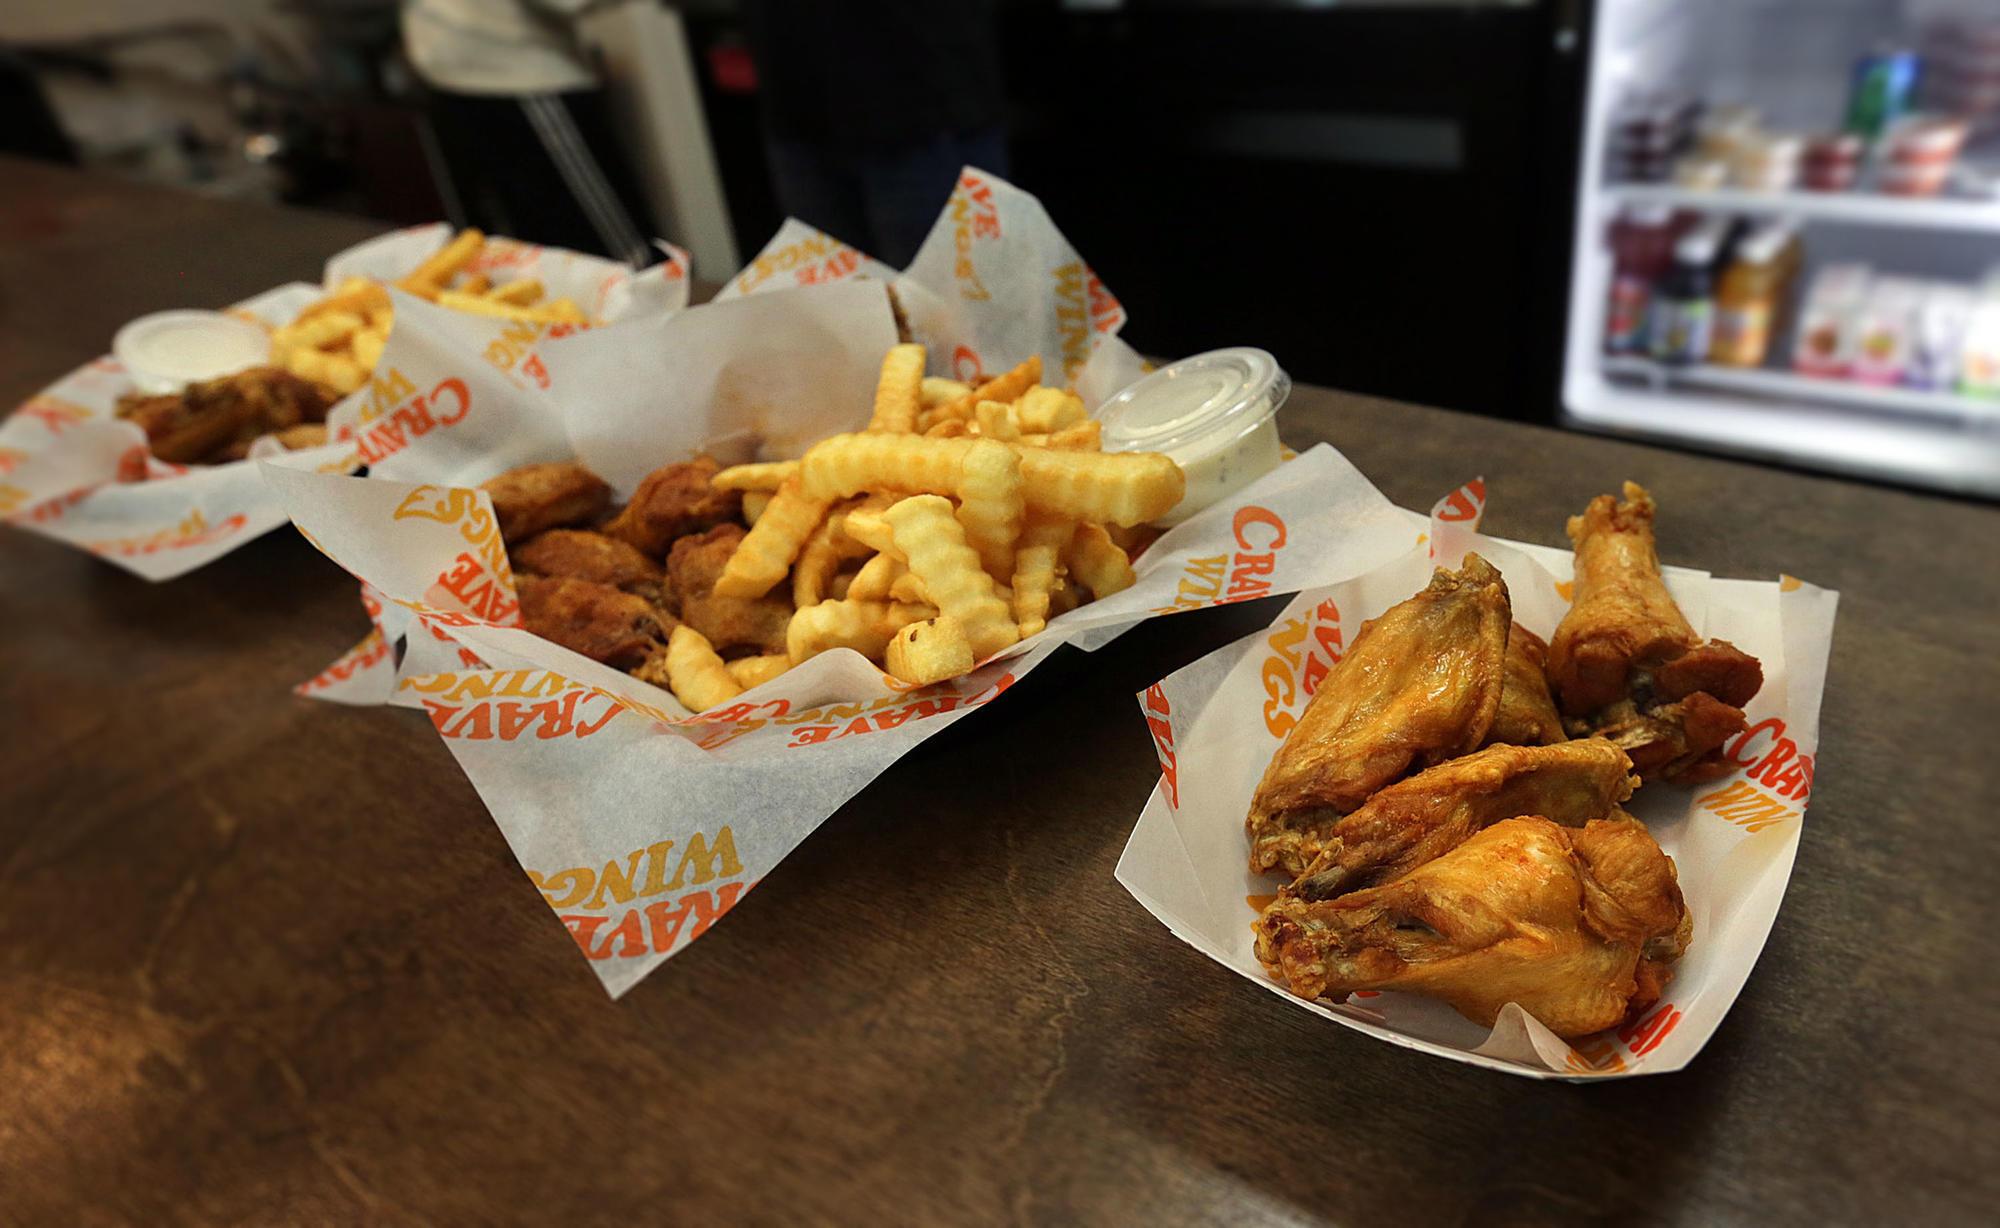 Peninsula restaurant menus expand with Korean fare - Daily Press